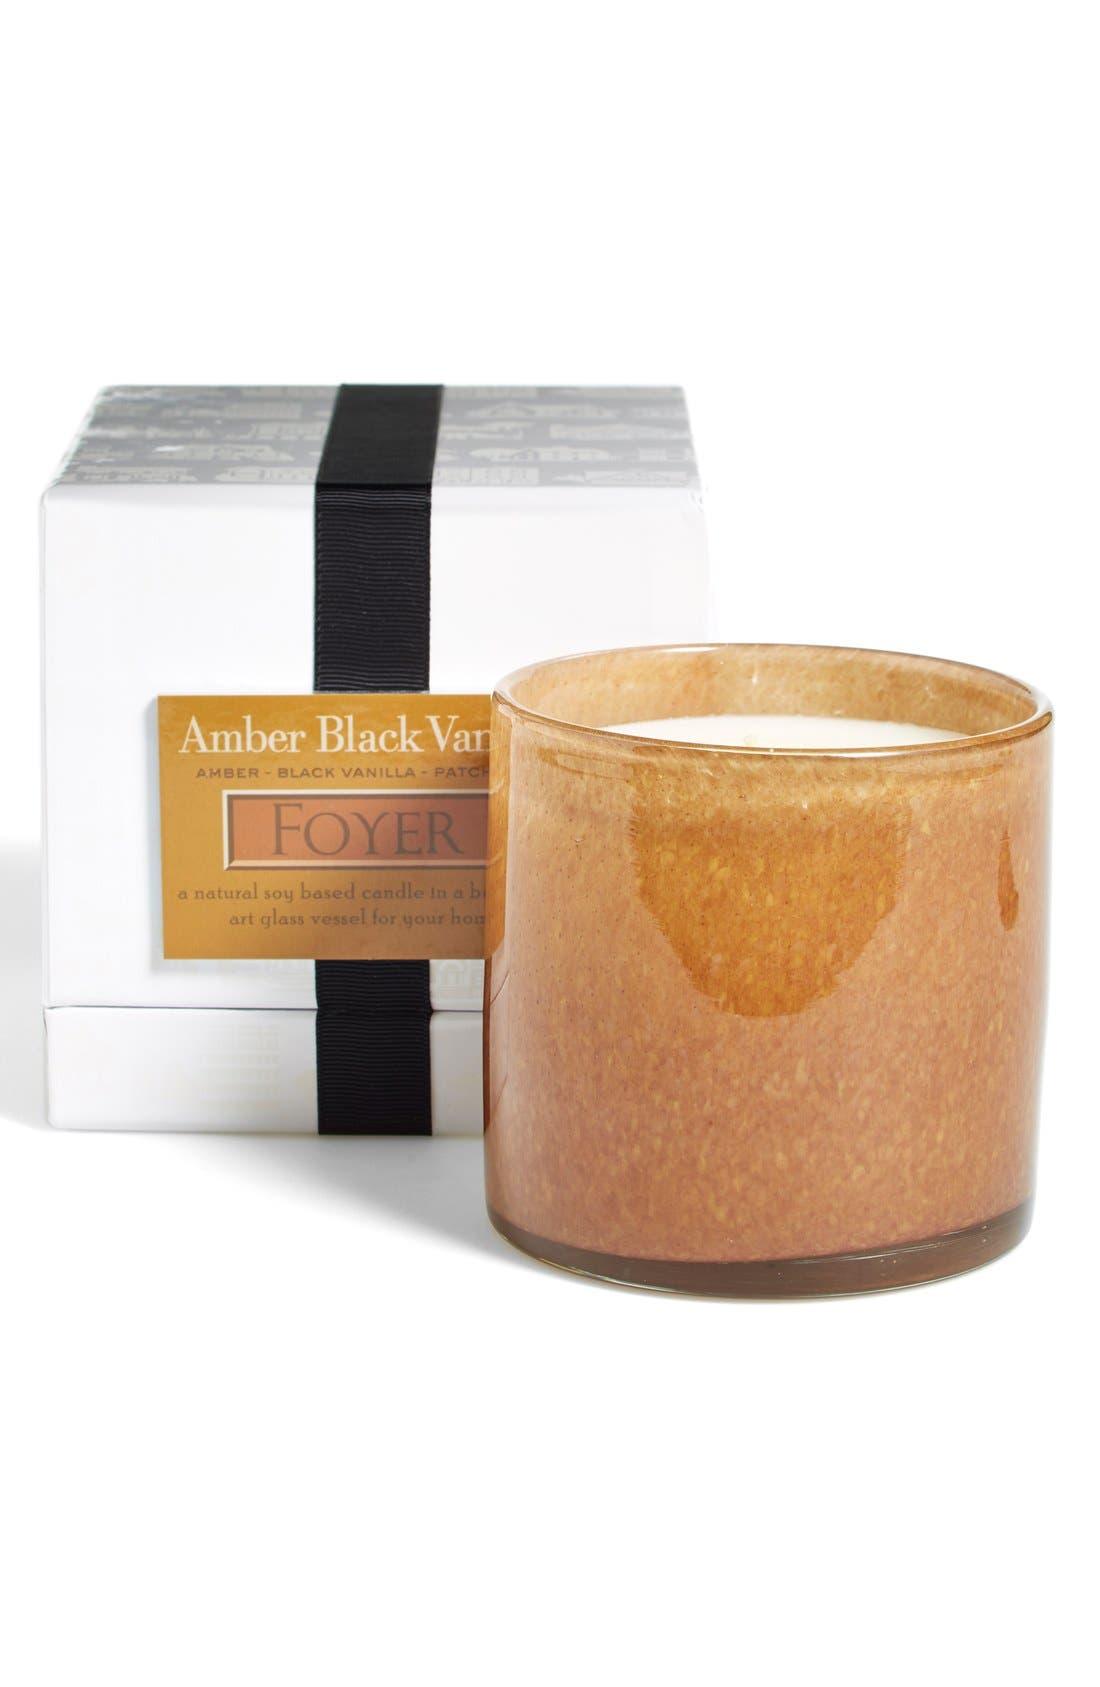 'Amber Black Vanilla - Foyer' Candle,                             Alternate thumbnail 2, color,                             NO COLOR